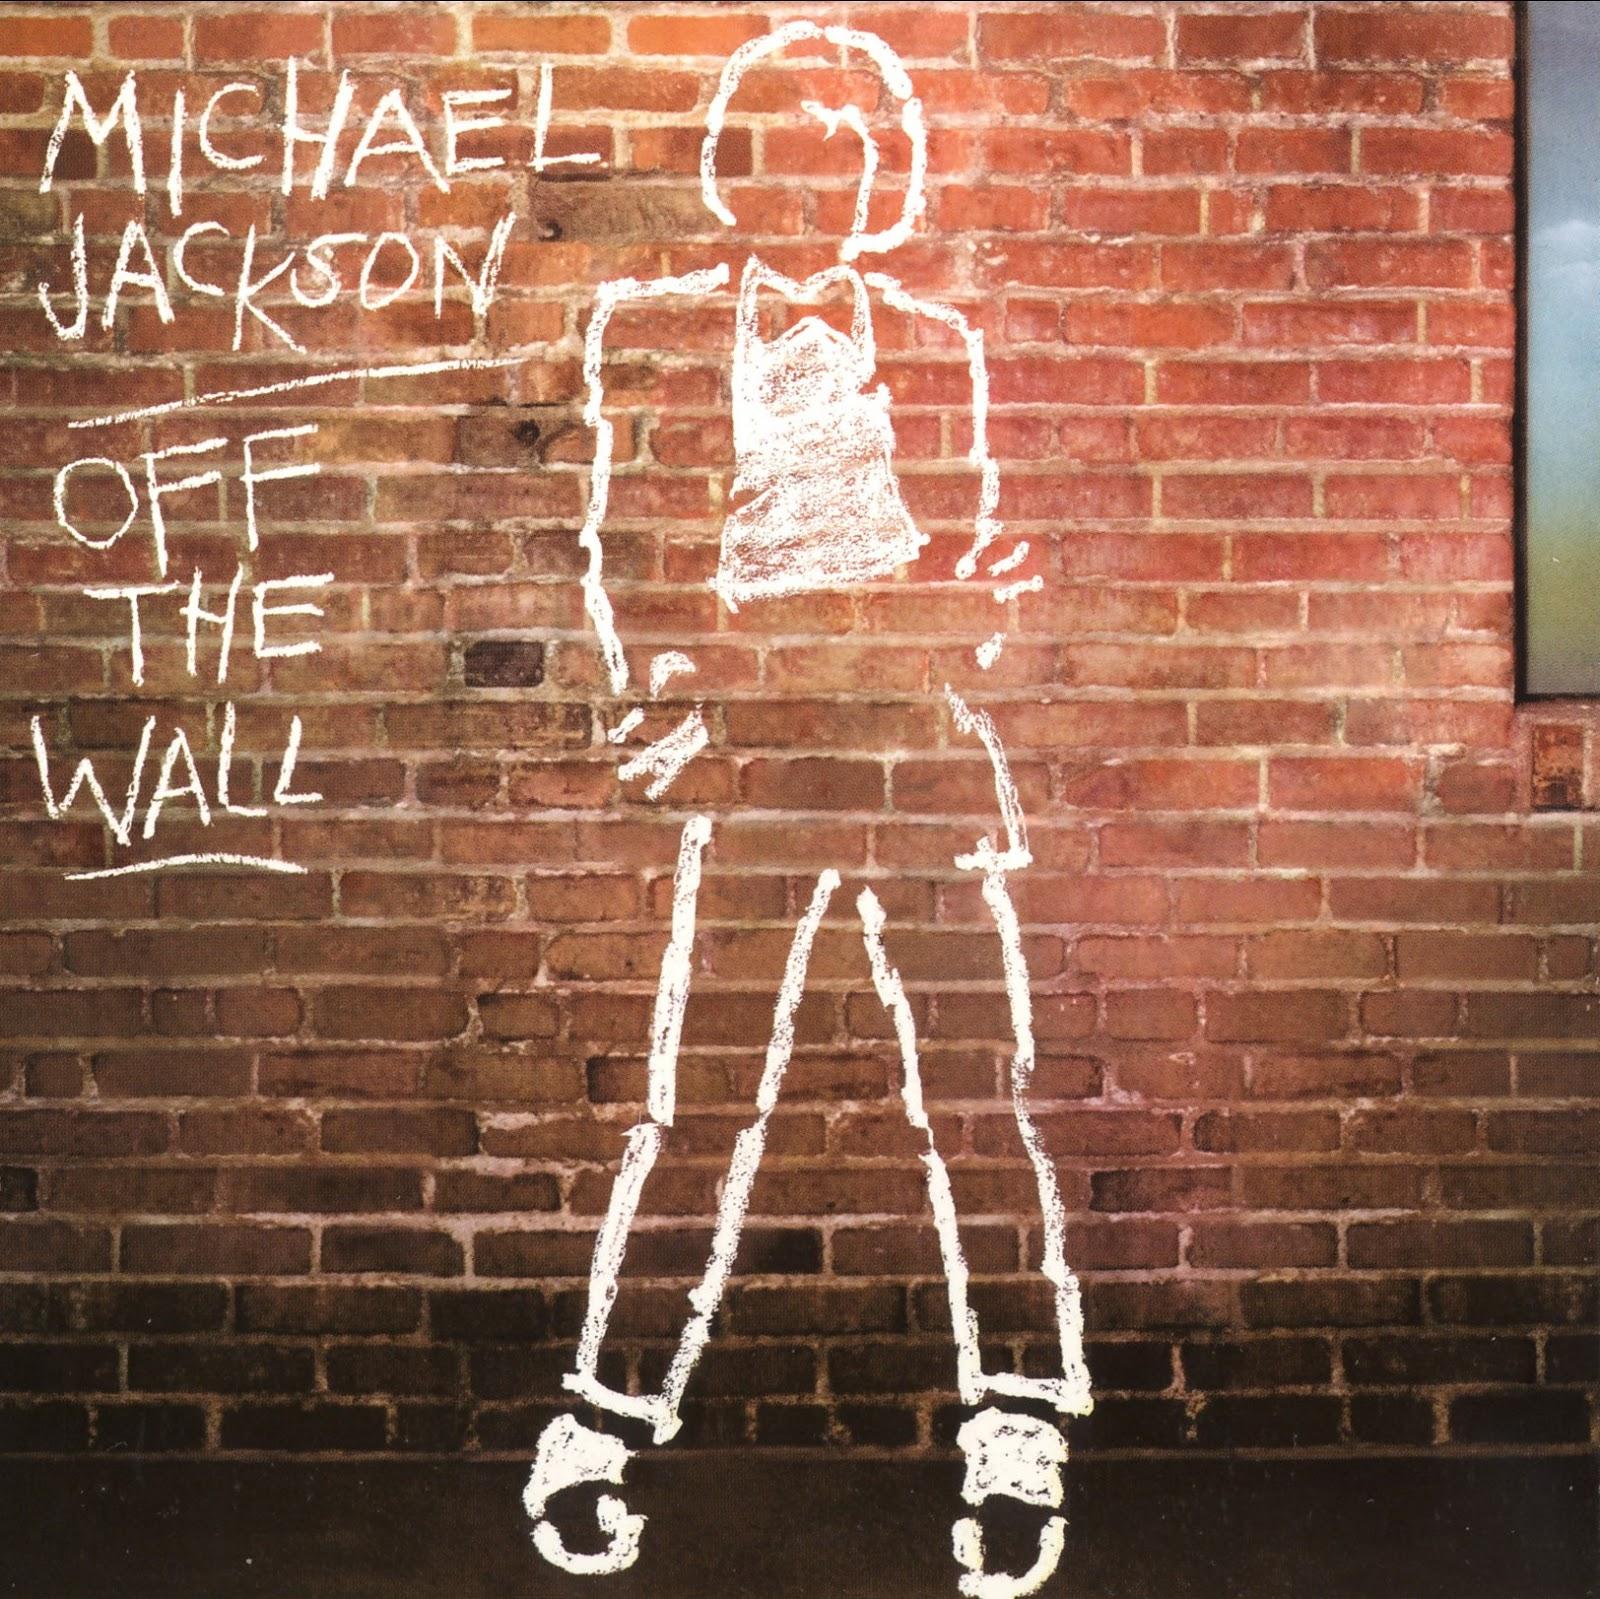 Michael Jackson: «Off the Wall» (II)